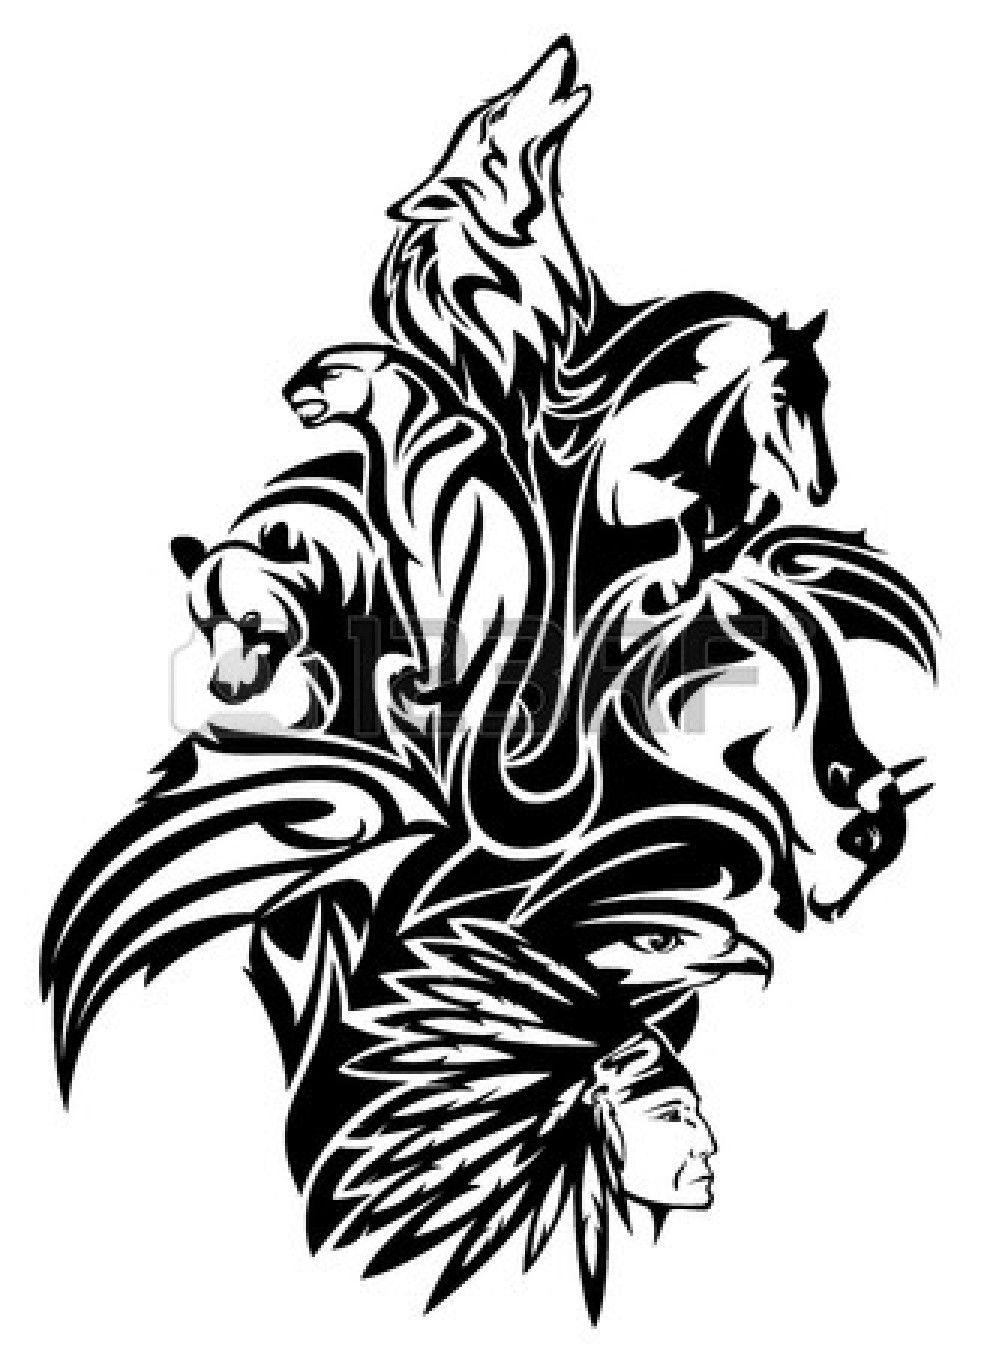 Native American Chief With Animal Spirits Design Black And Tribal Animal Tattoos Tribal Animals Native American Tattoos